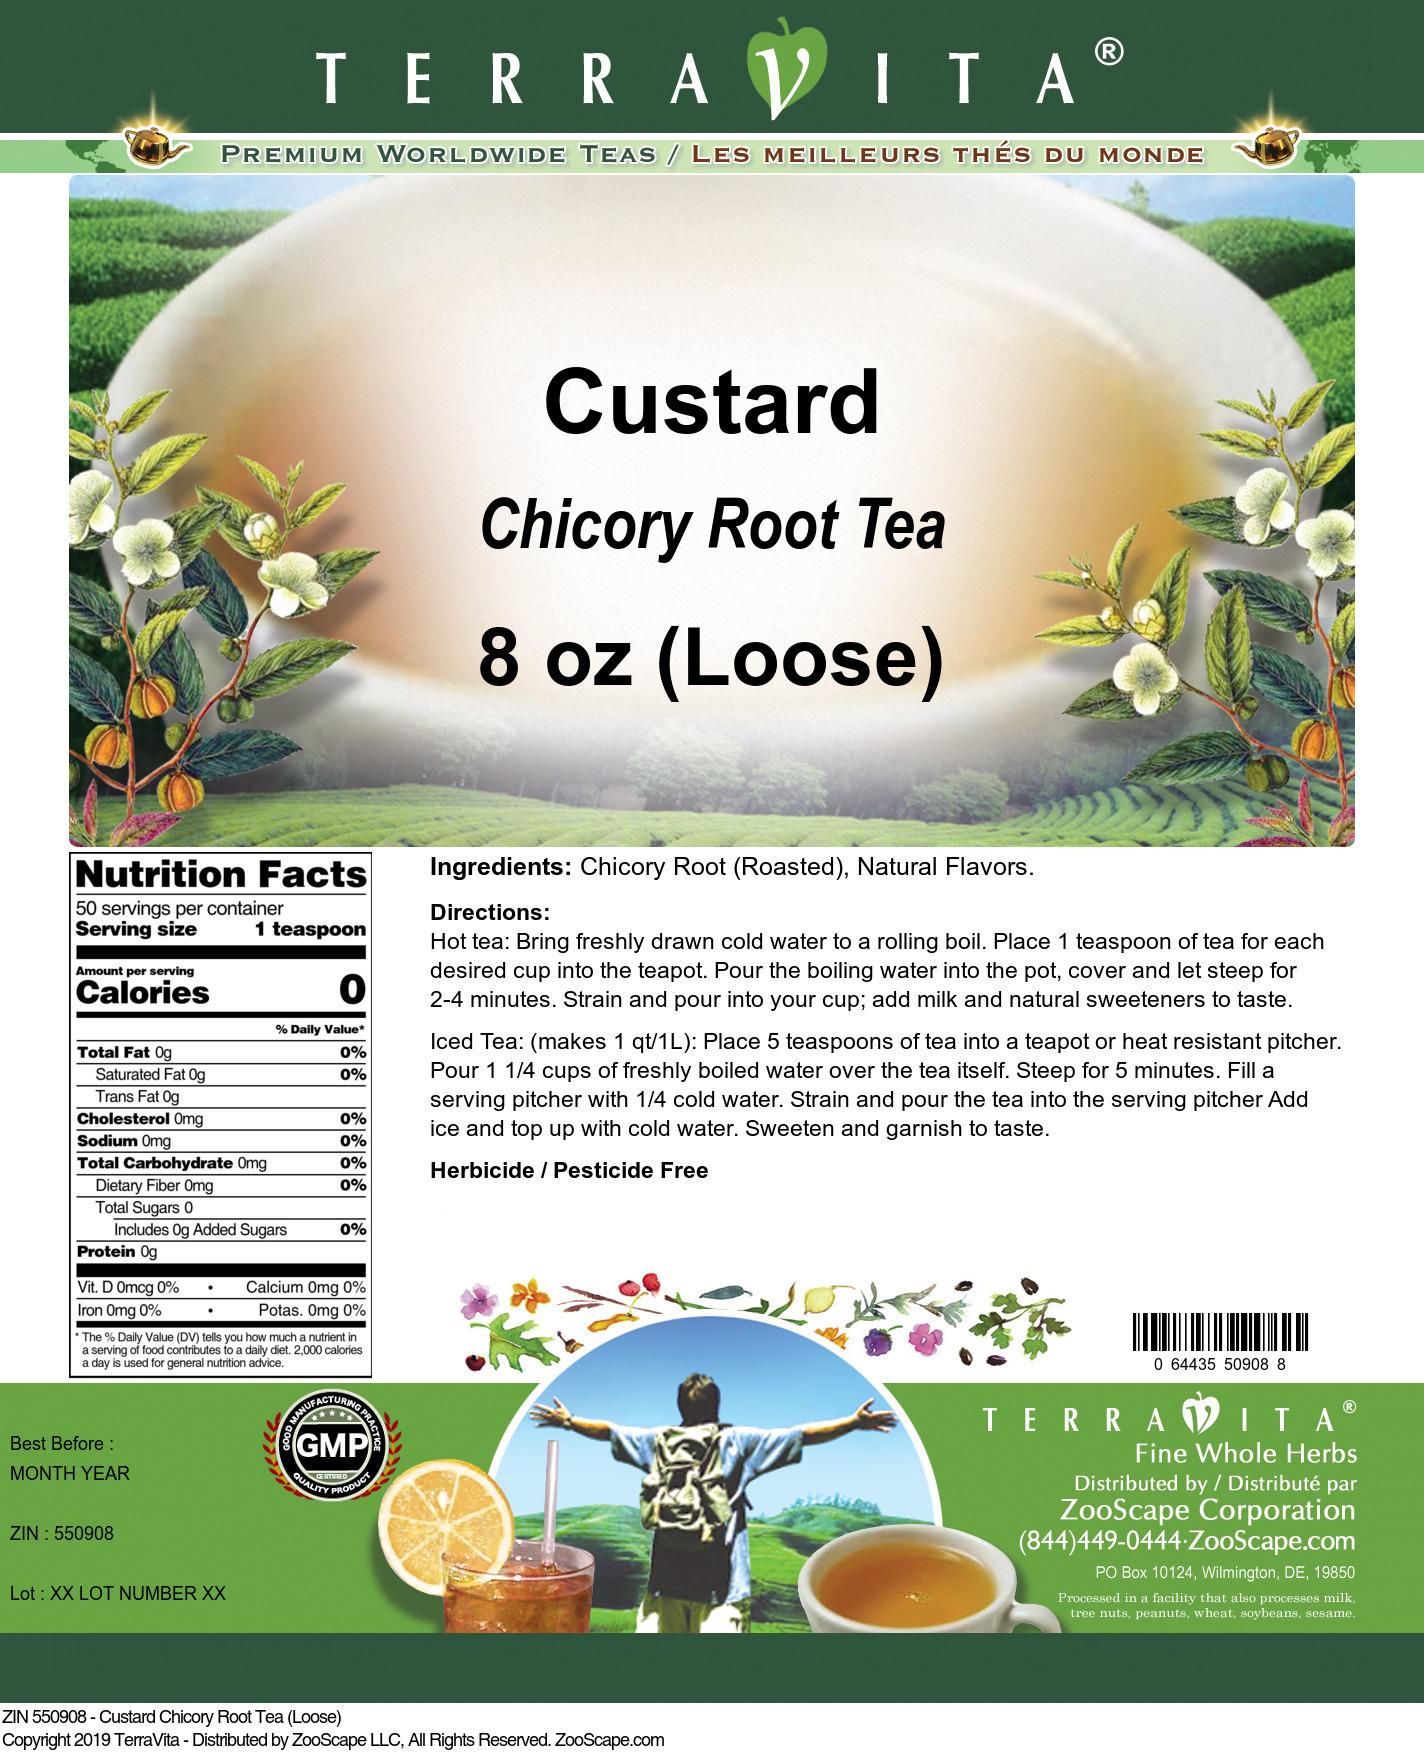 Custard Chicory Root Tea (Loose)